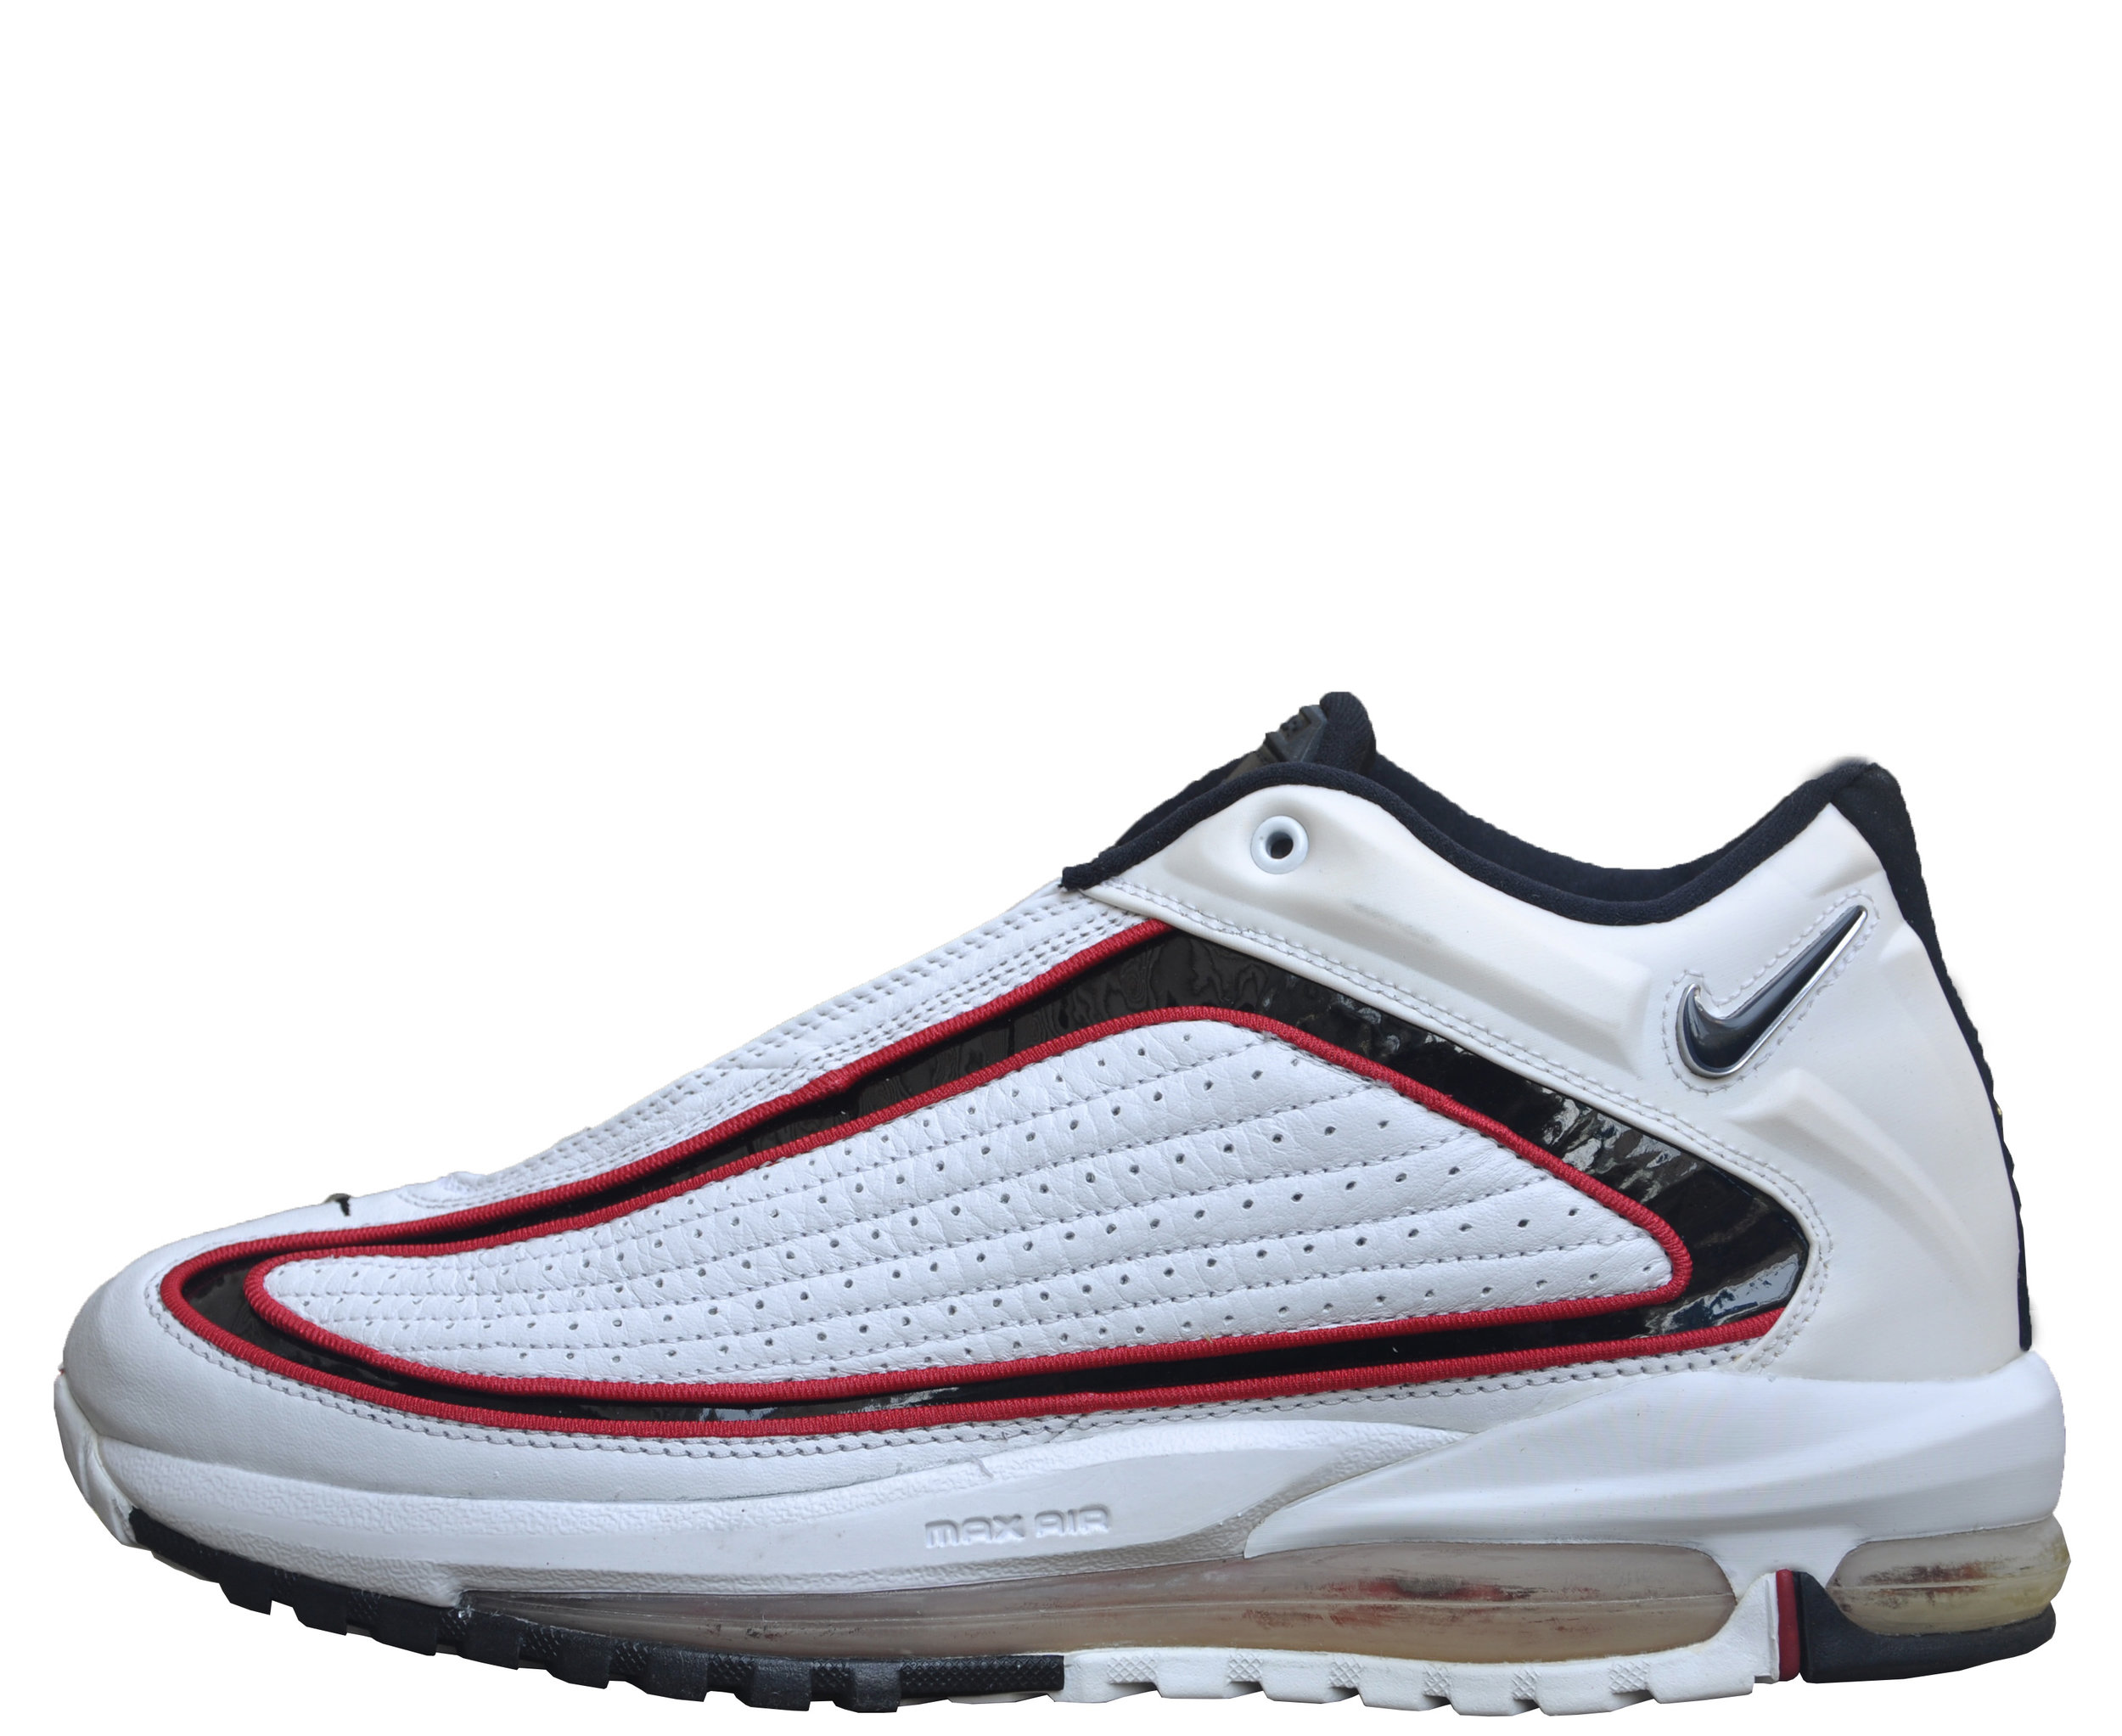 Nike Griffey Max GD II White / Black